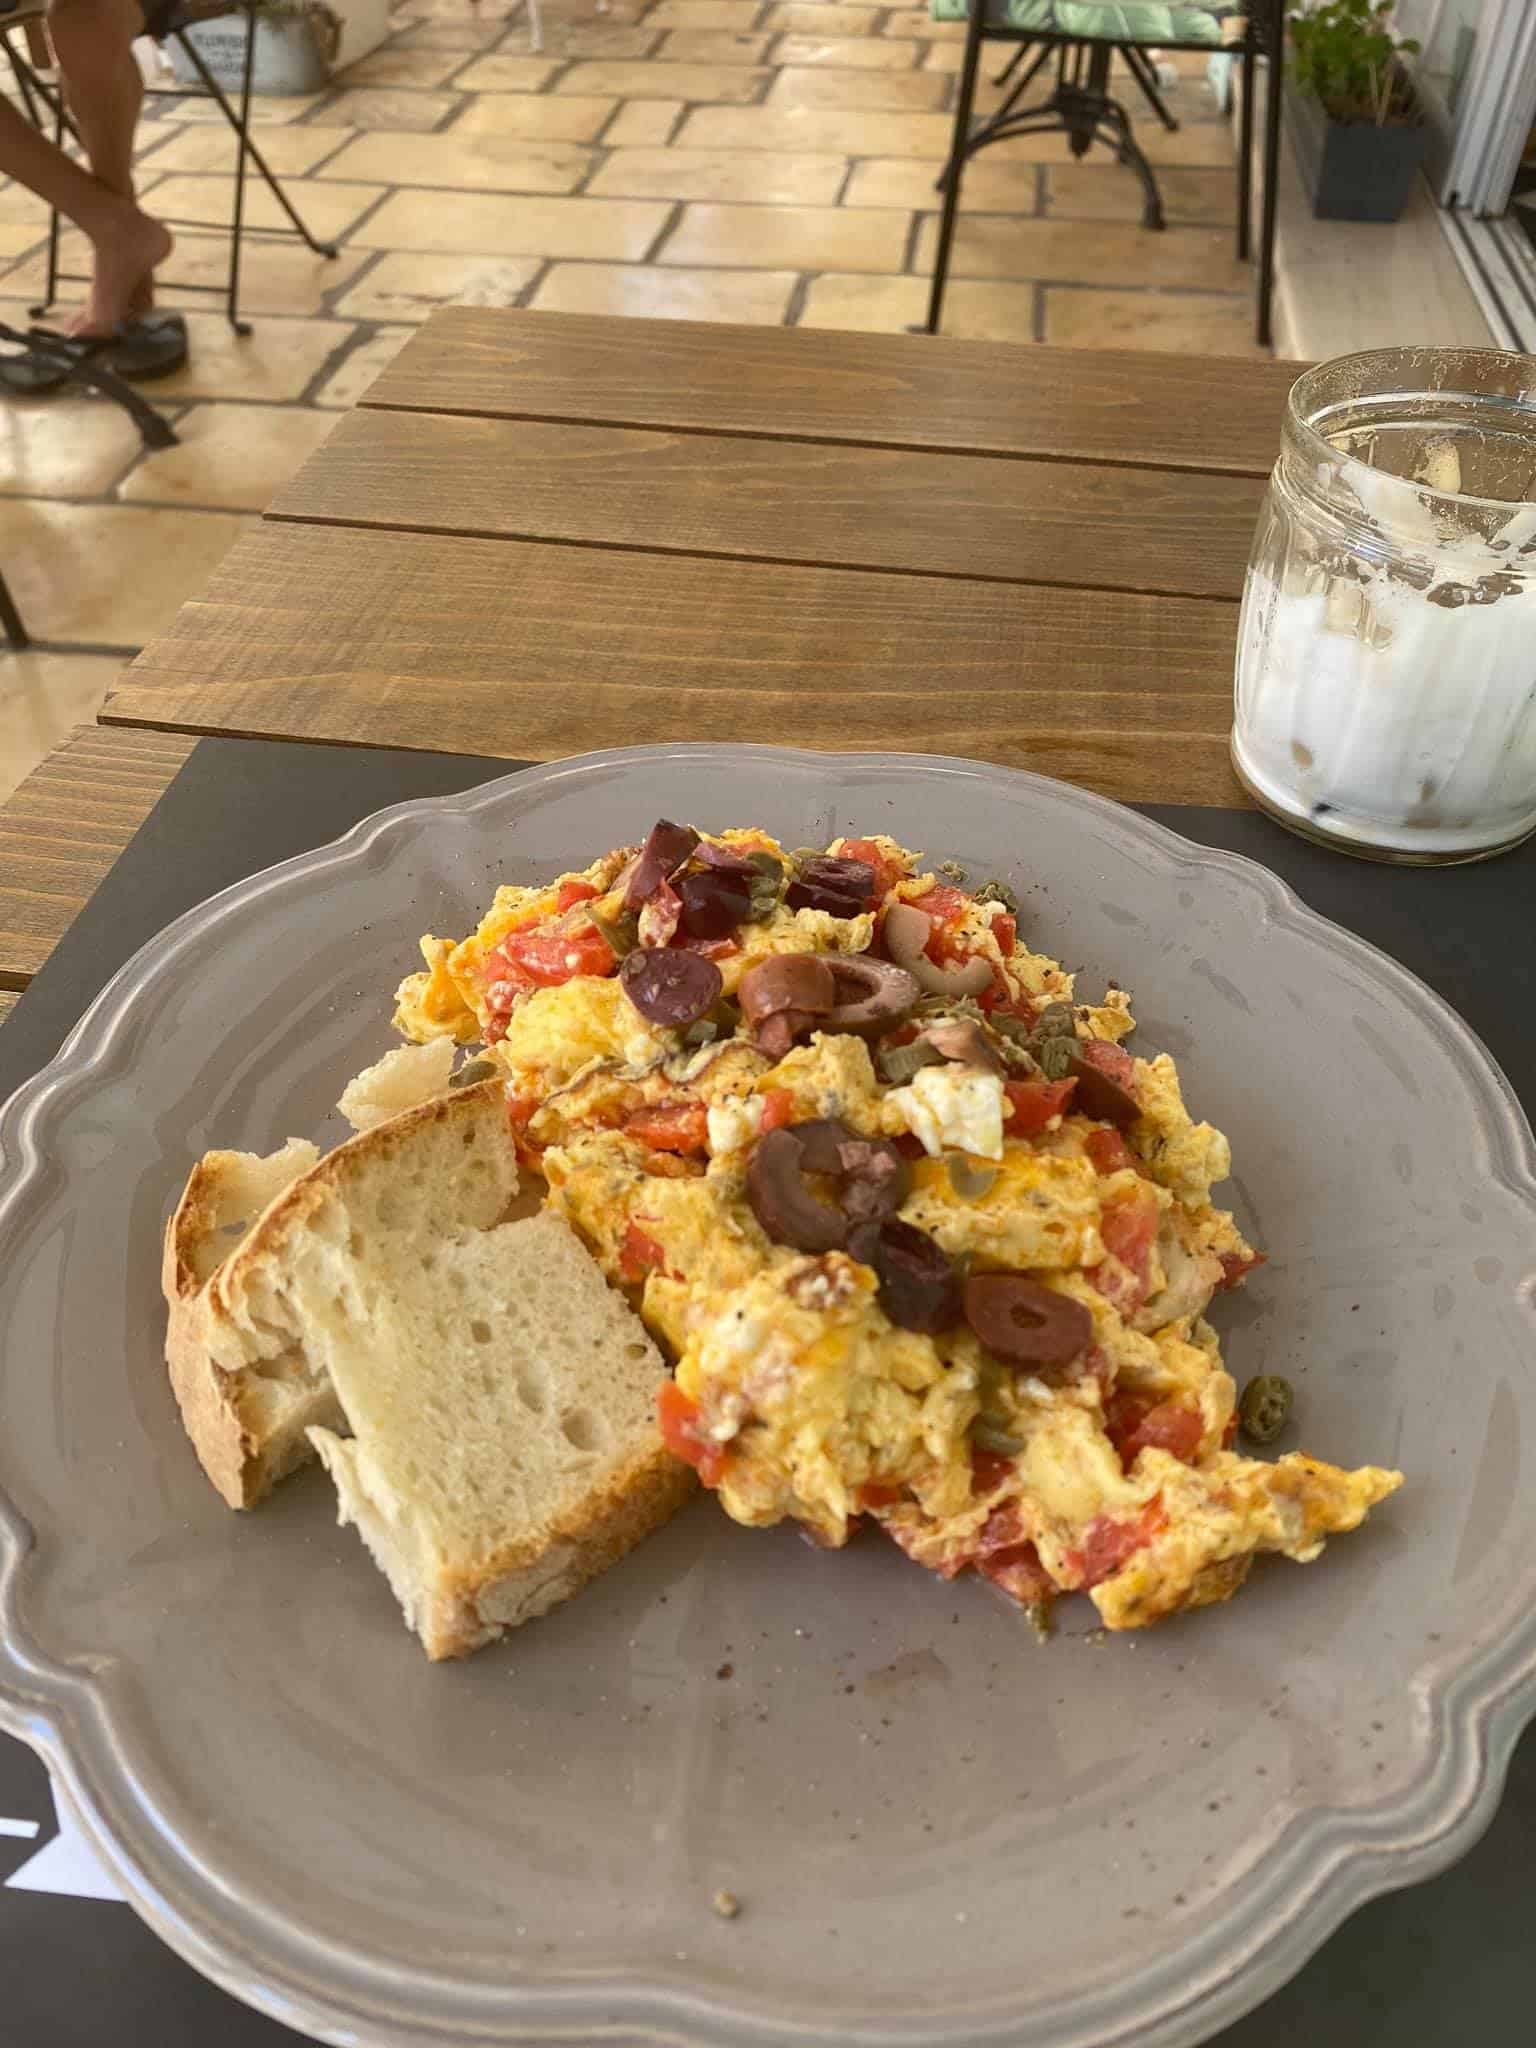 Slow cooked Mediterranean eggs at Fanalino Restaurant, Gaios